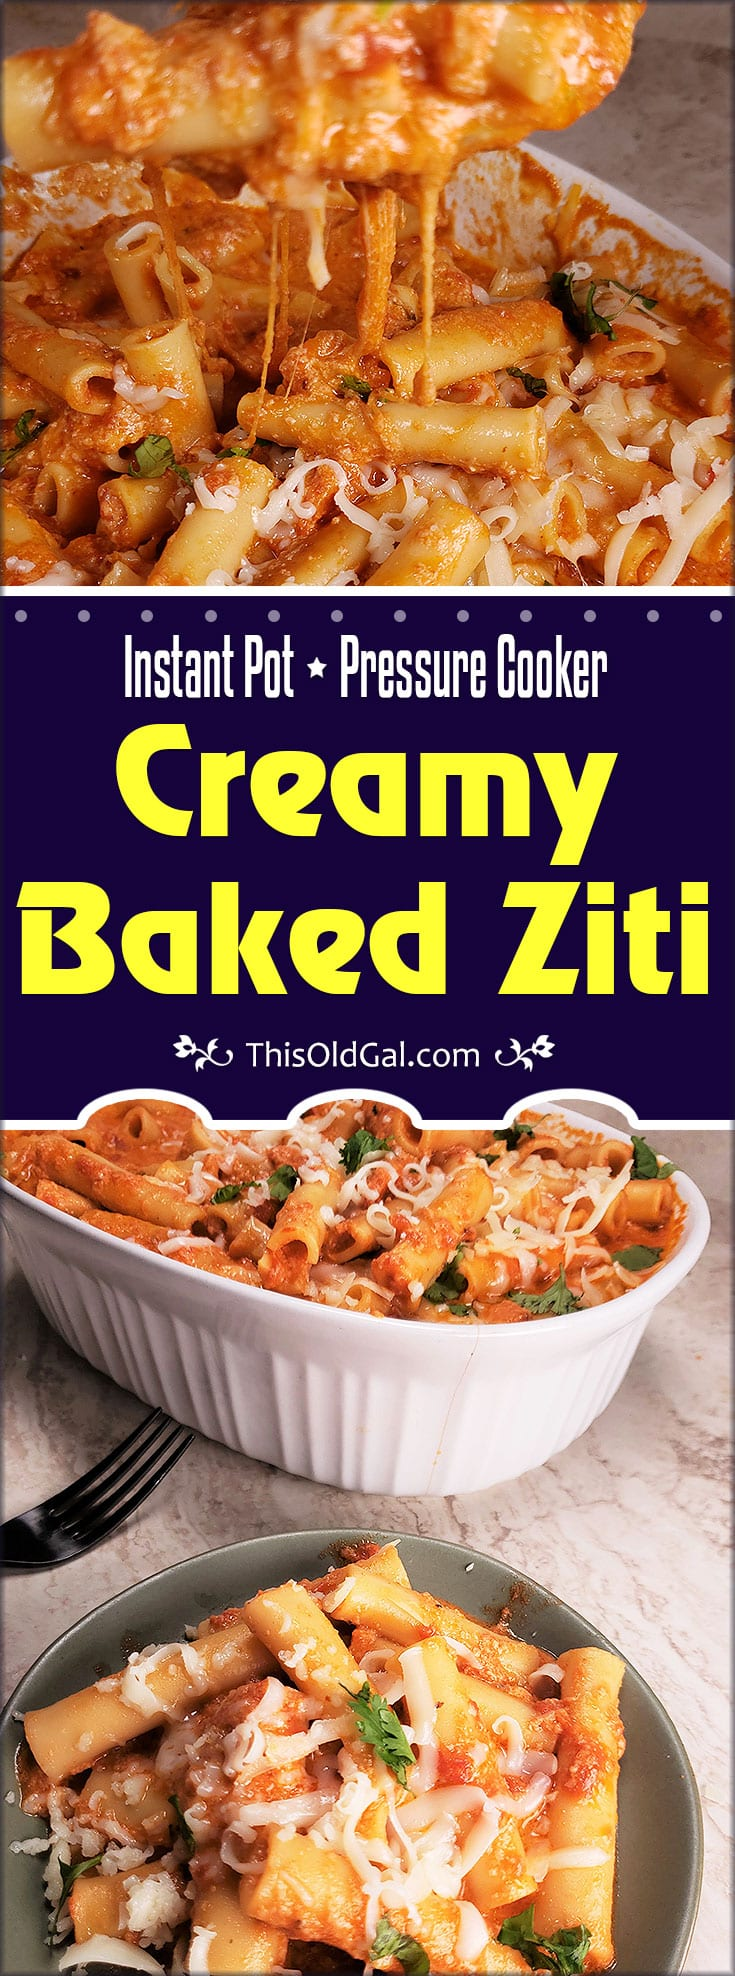 Instant Pot Pressure Cooker Creamy Baked Ziti